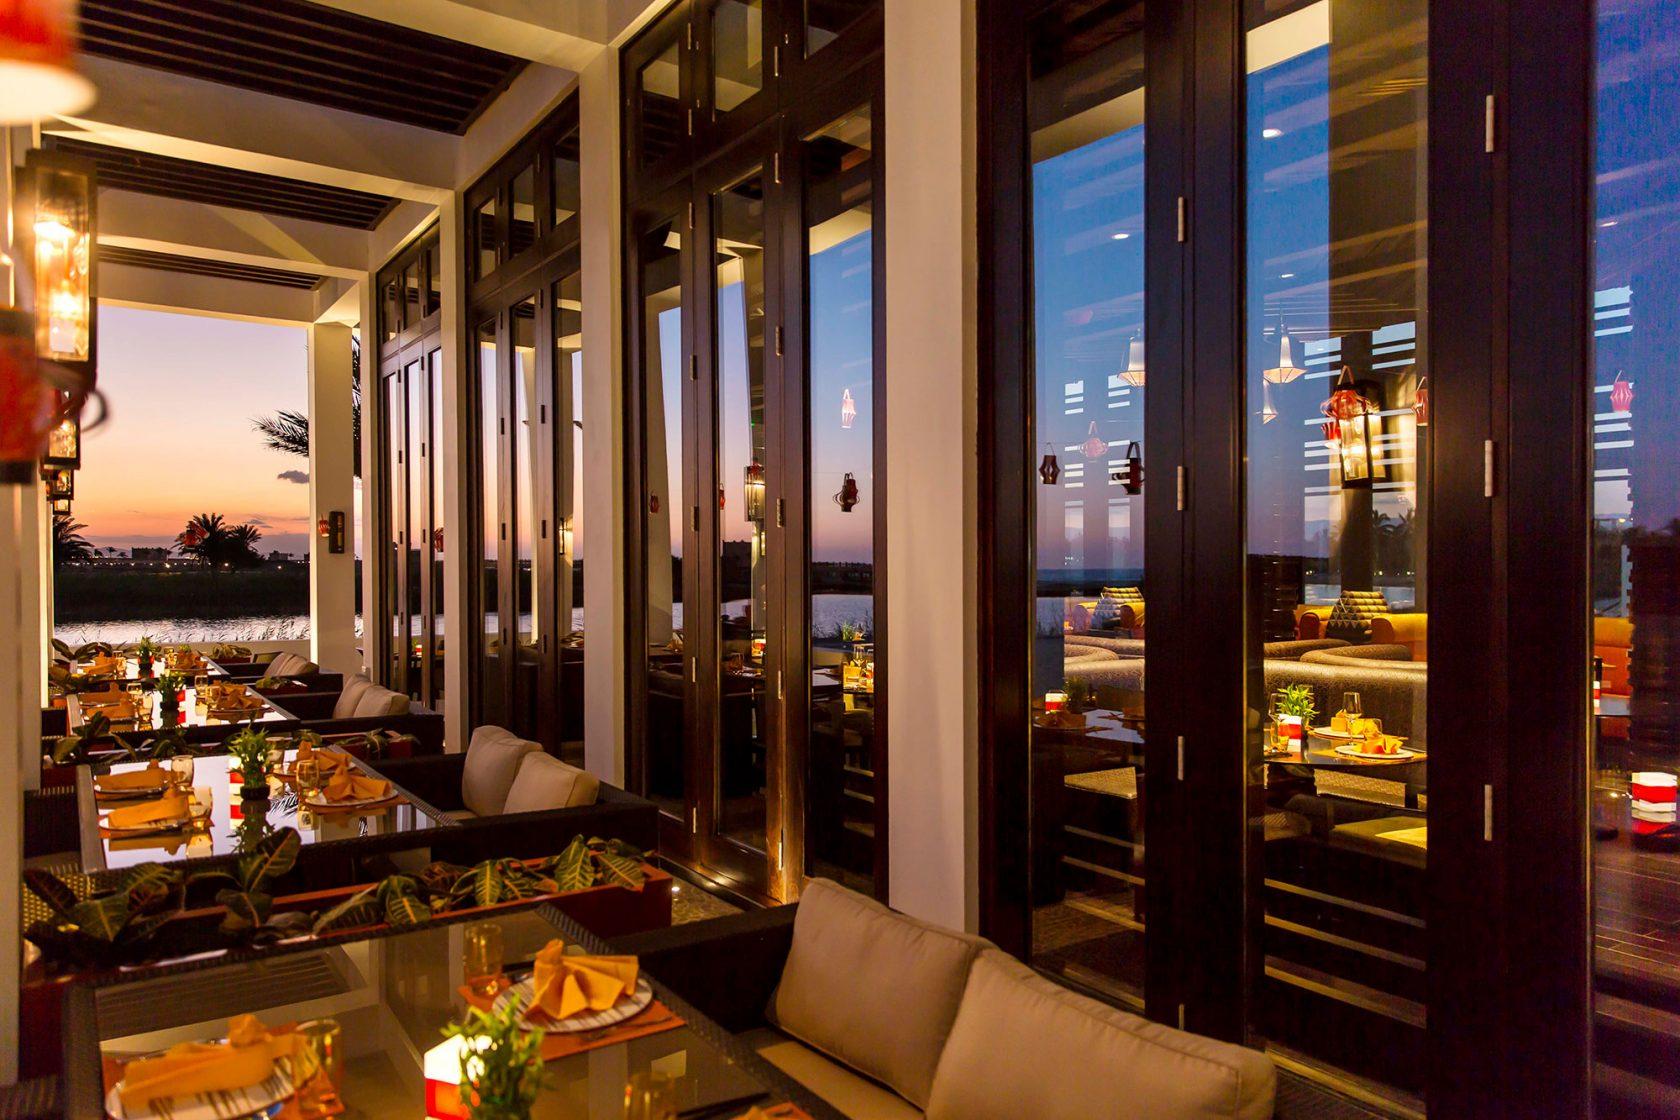 Al Baleed Resort by Anantara Mekong Terrace night